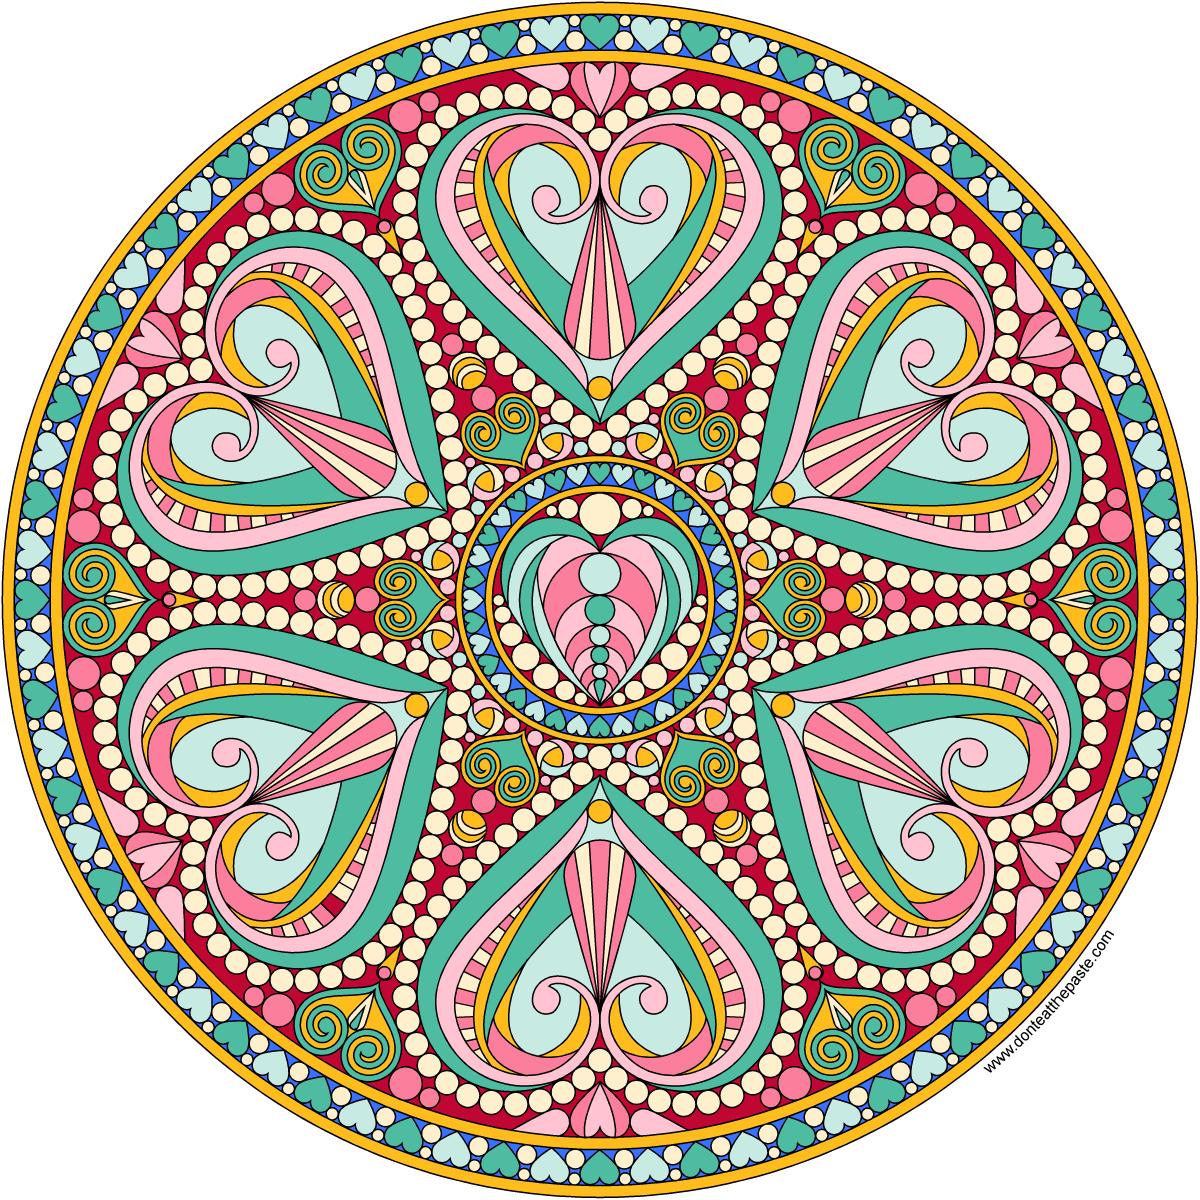 Coloring Mandalas On Pinterest